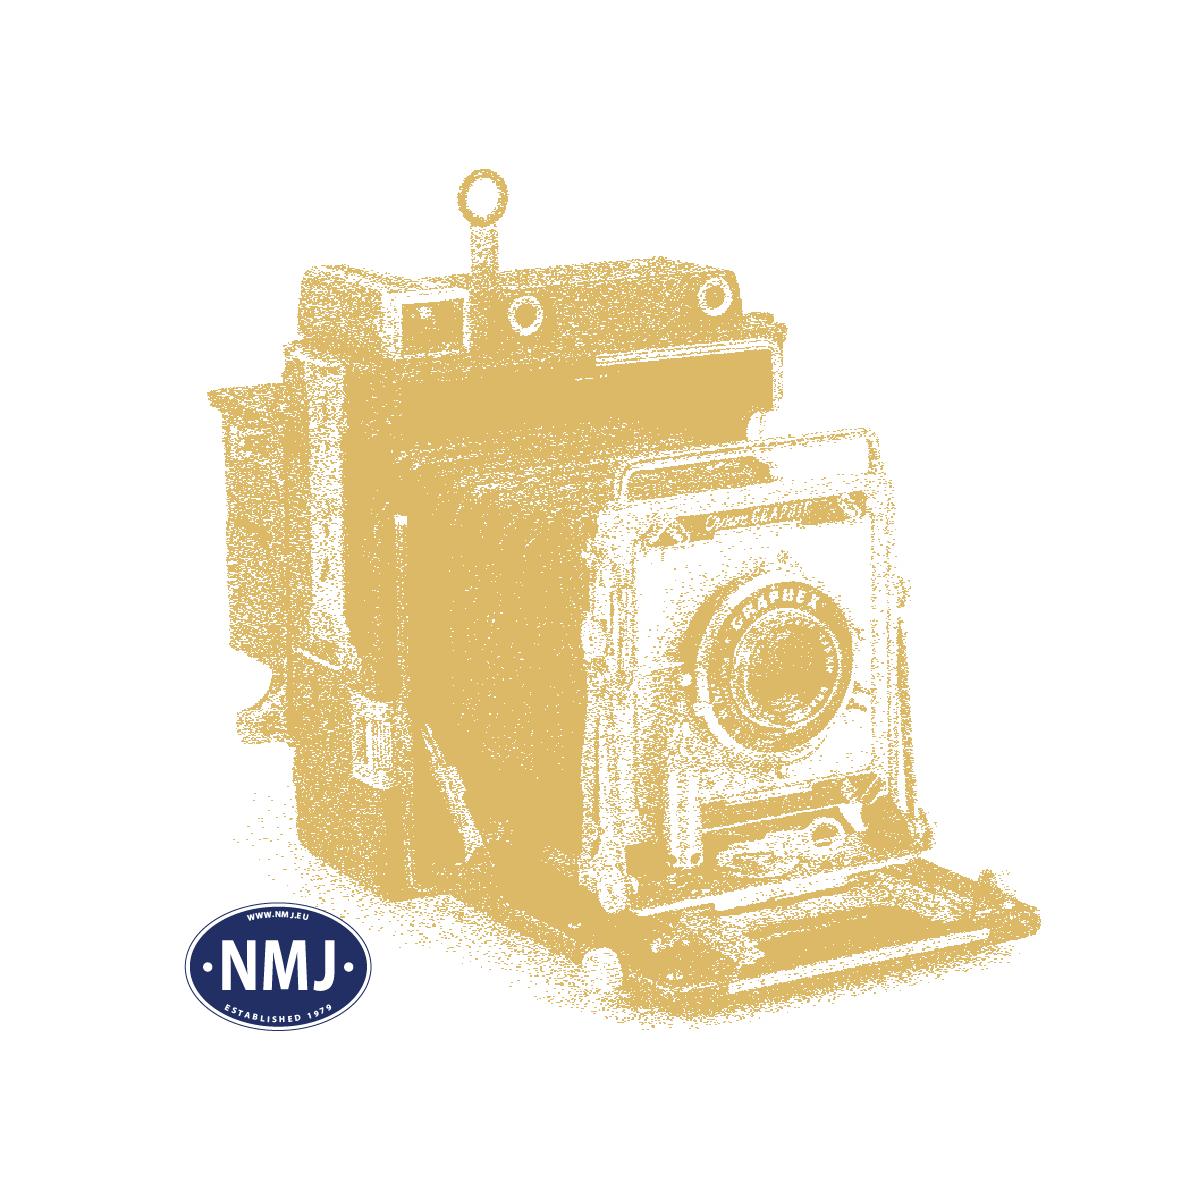 NMJT80.202AC - NMJ Topline NSB EL17.2231, AC, rot/schwarz